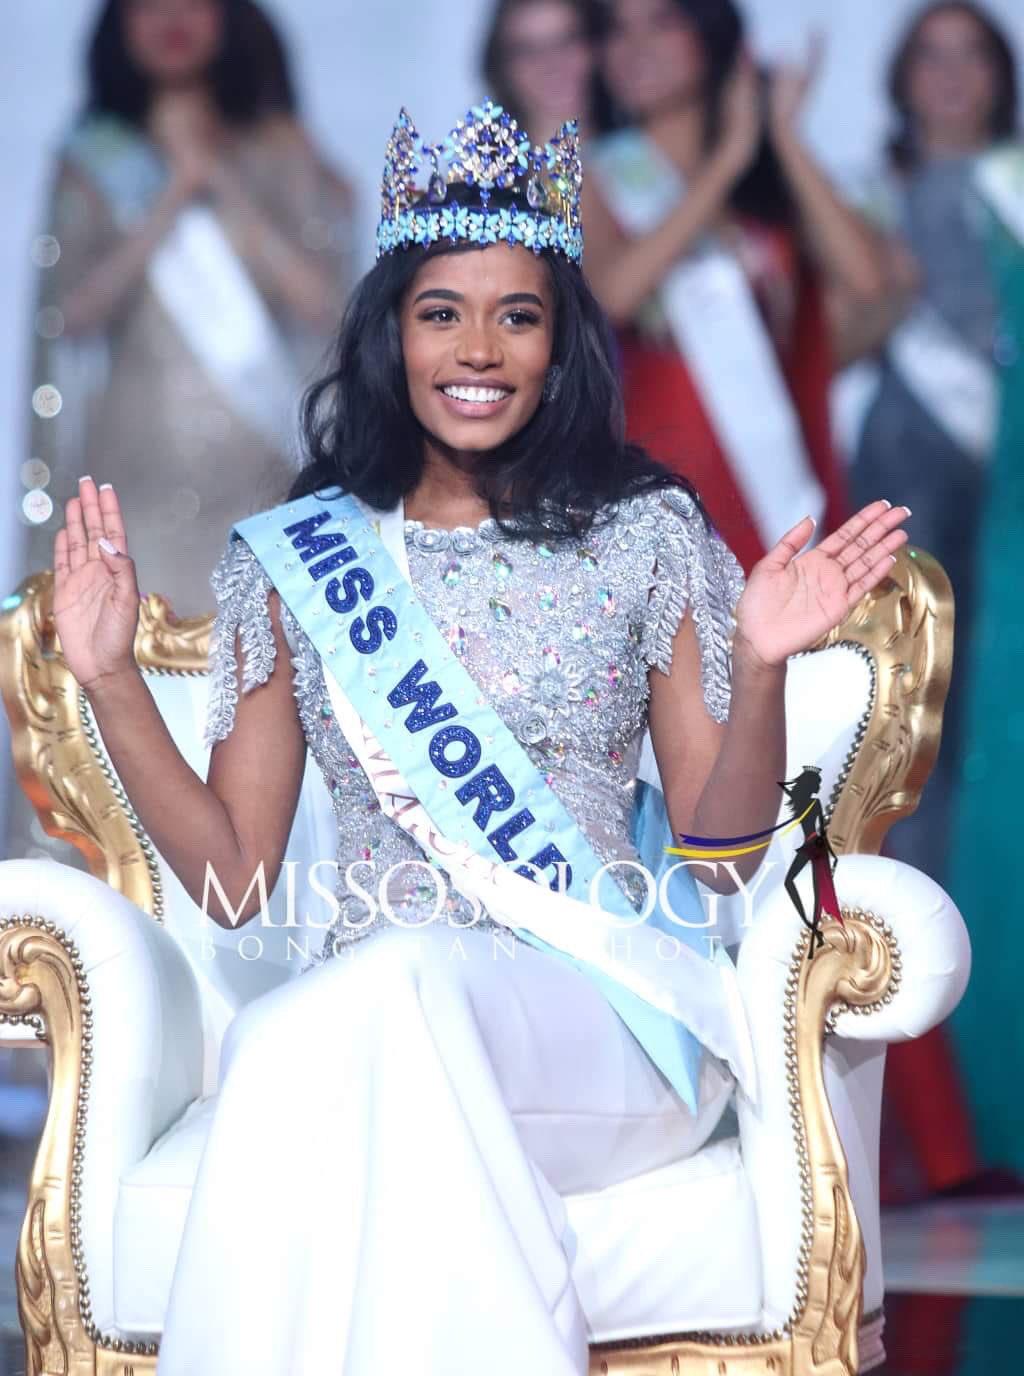 toni-ann singh, miss world 2019. - Página 2 Elw8bd10